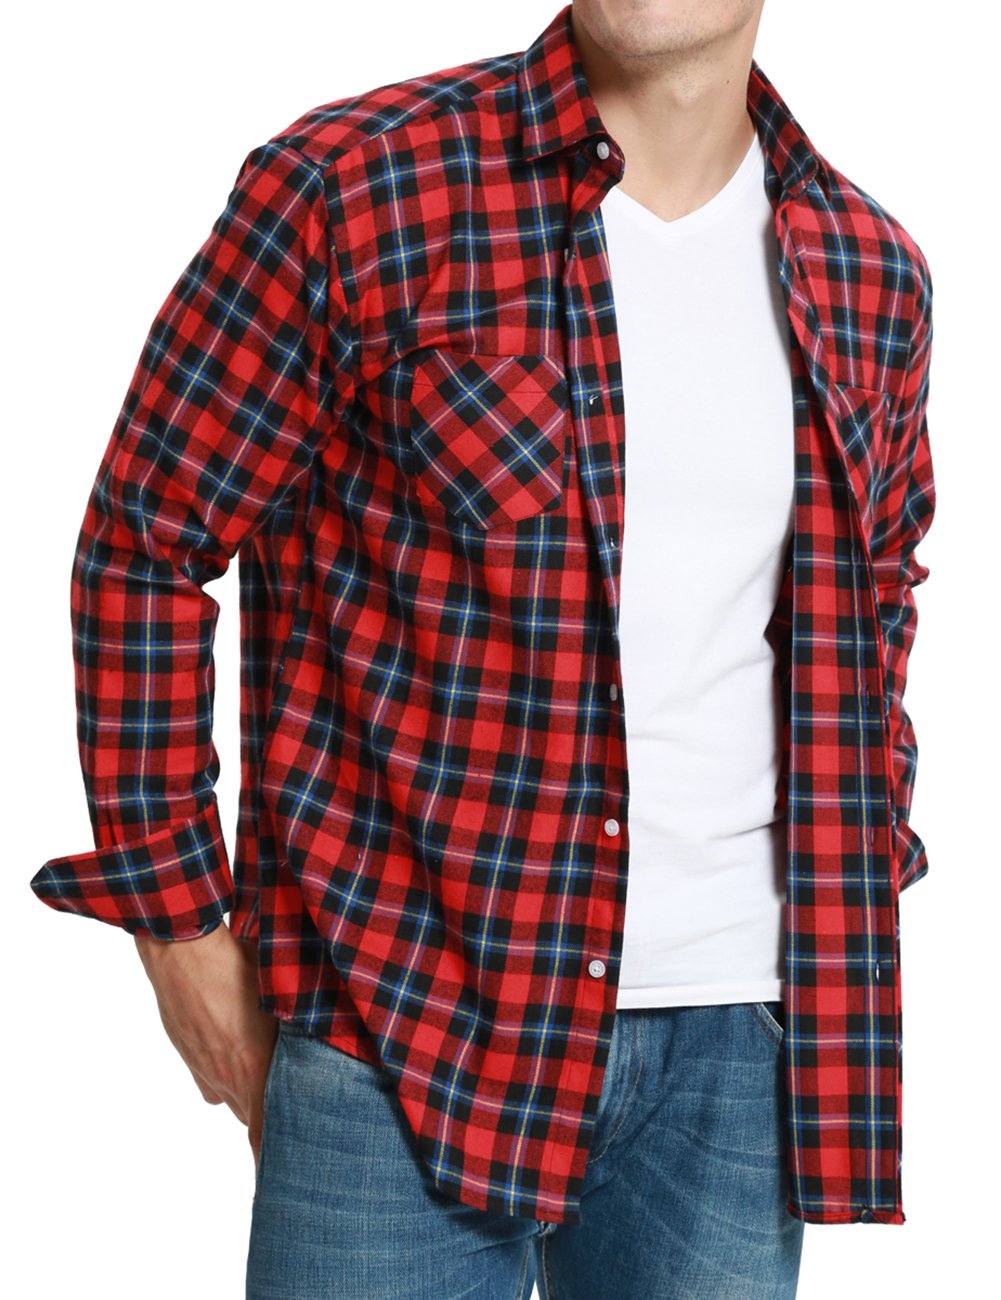 Dioufond Men's Flannel Plaid Long Sleeve Shirts